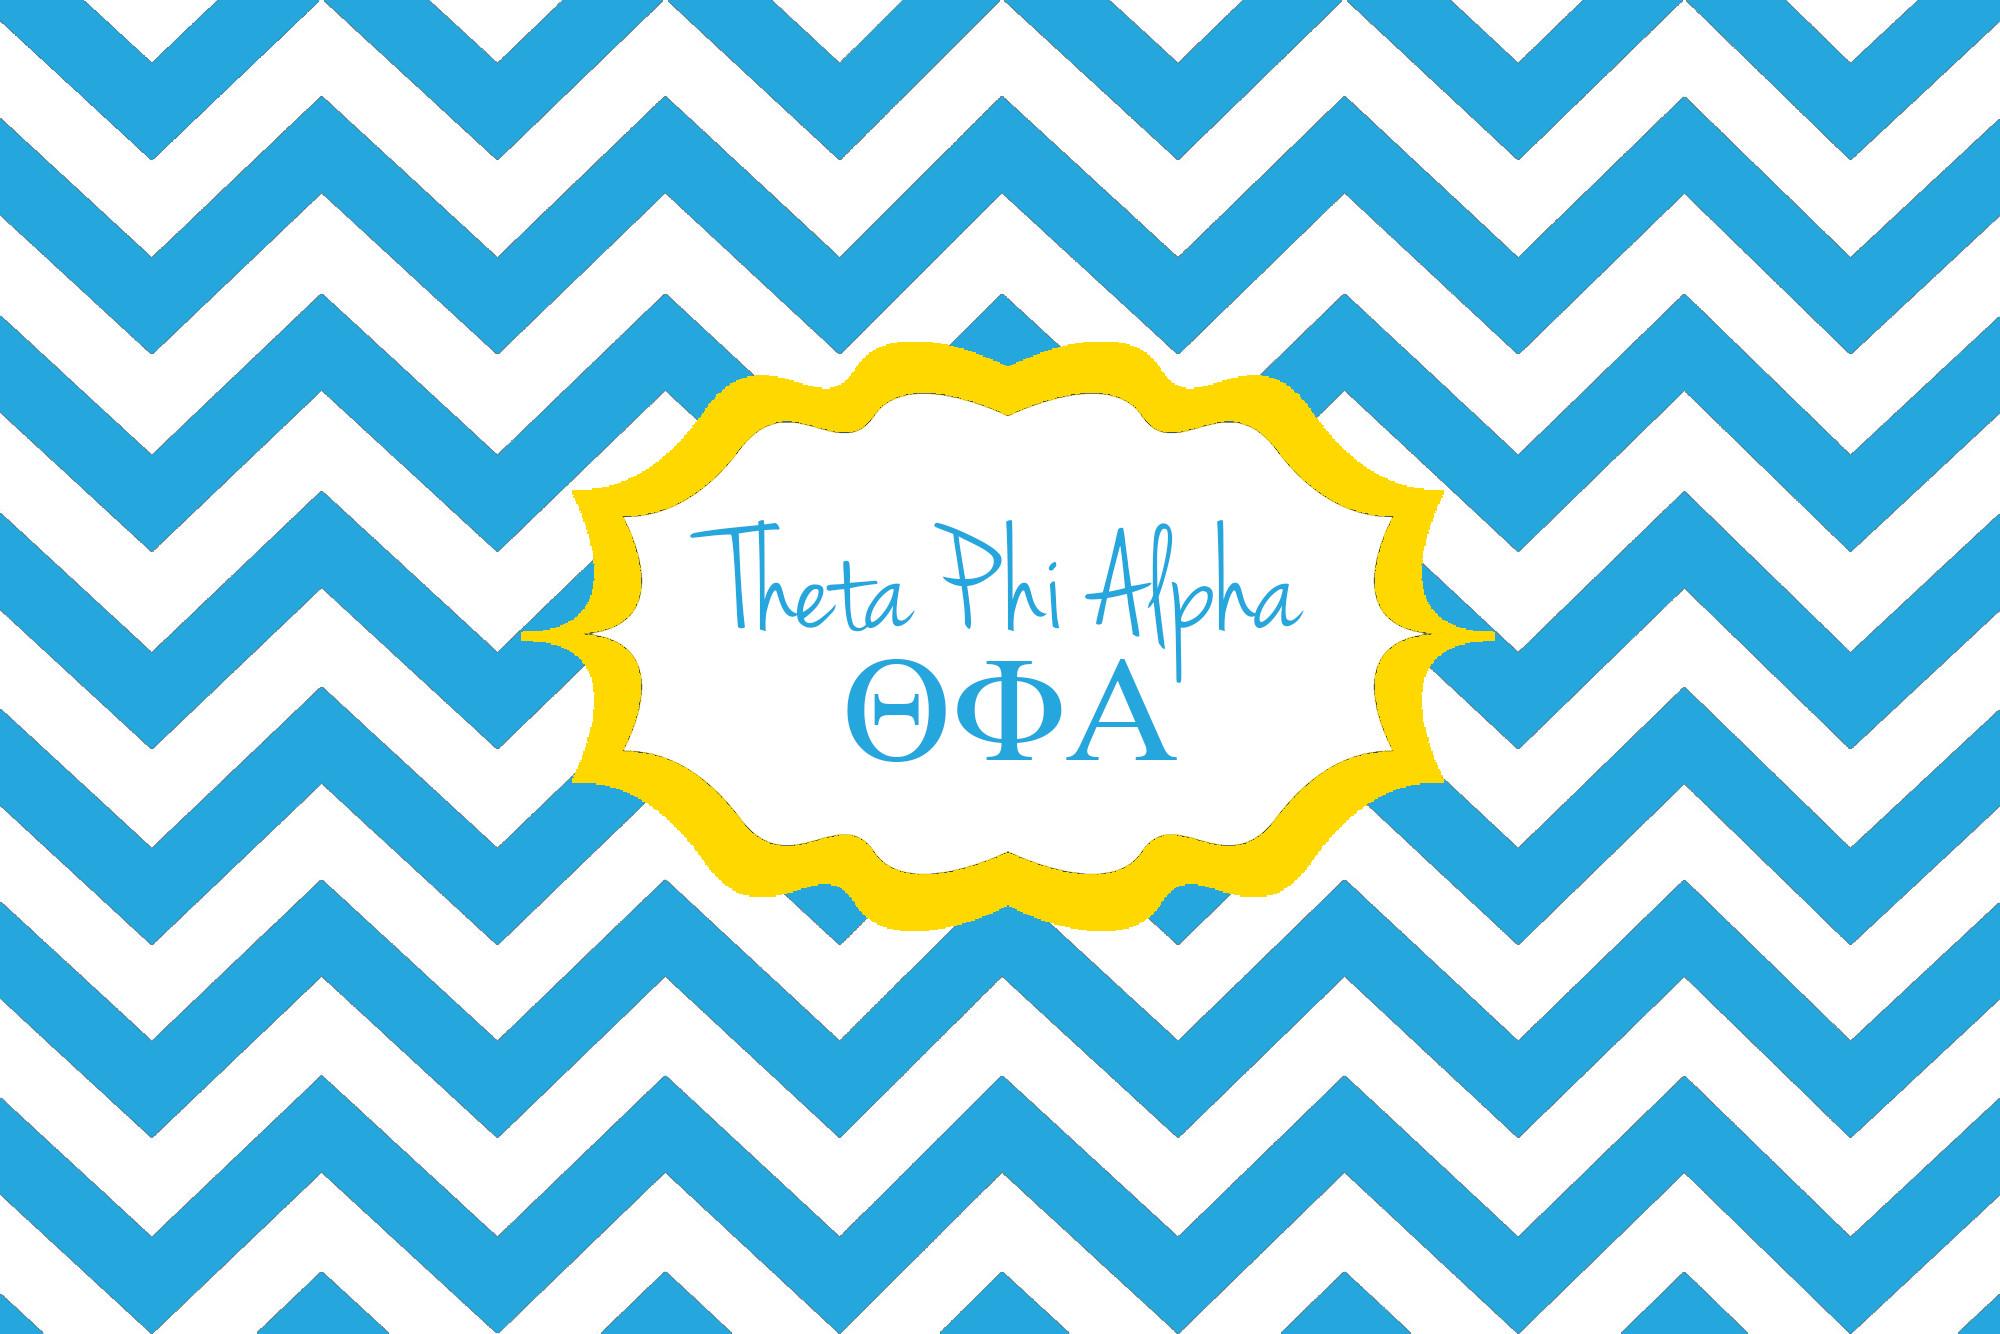 Theta Phi Alpha Background.